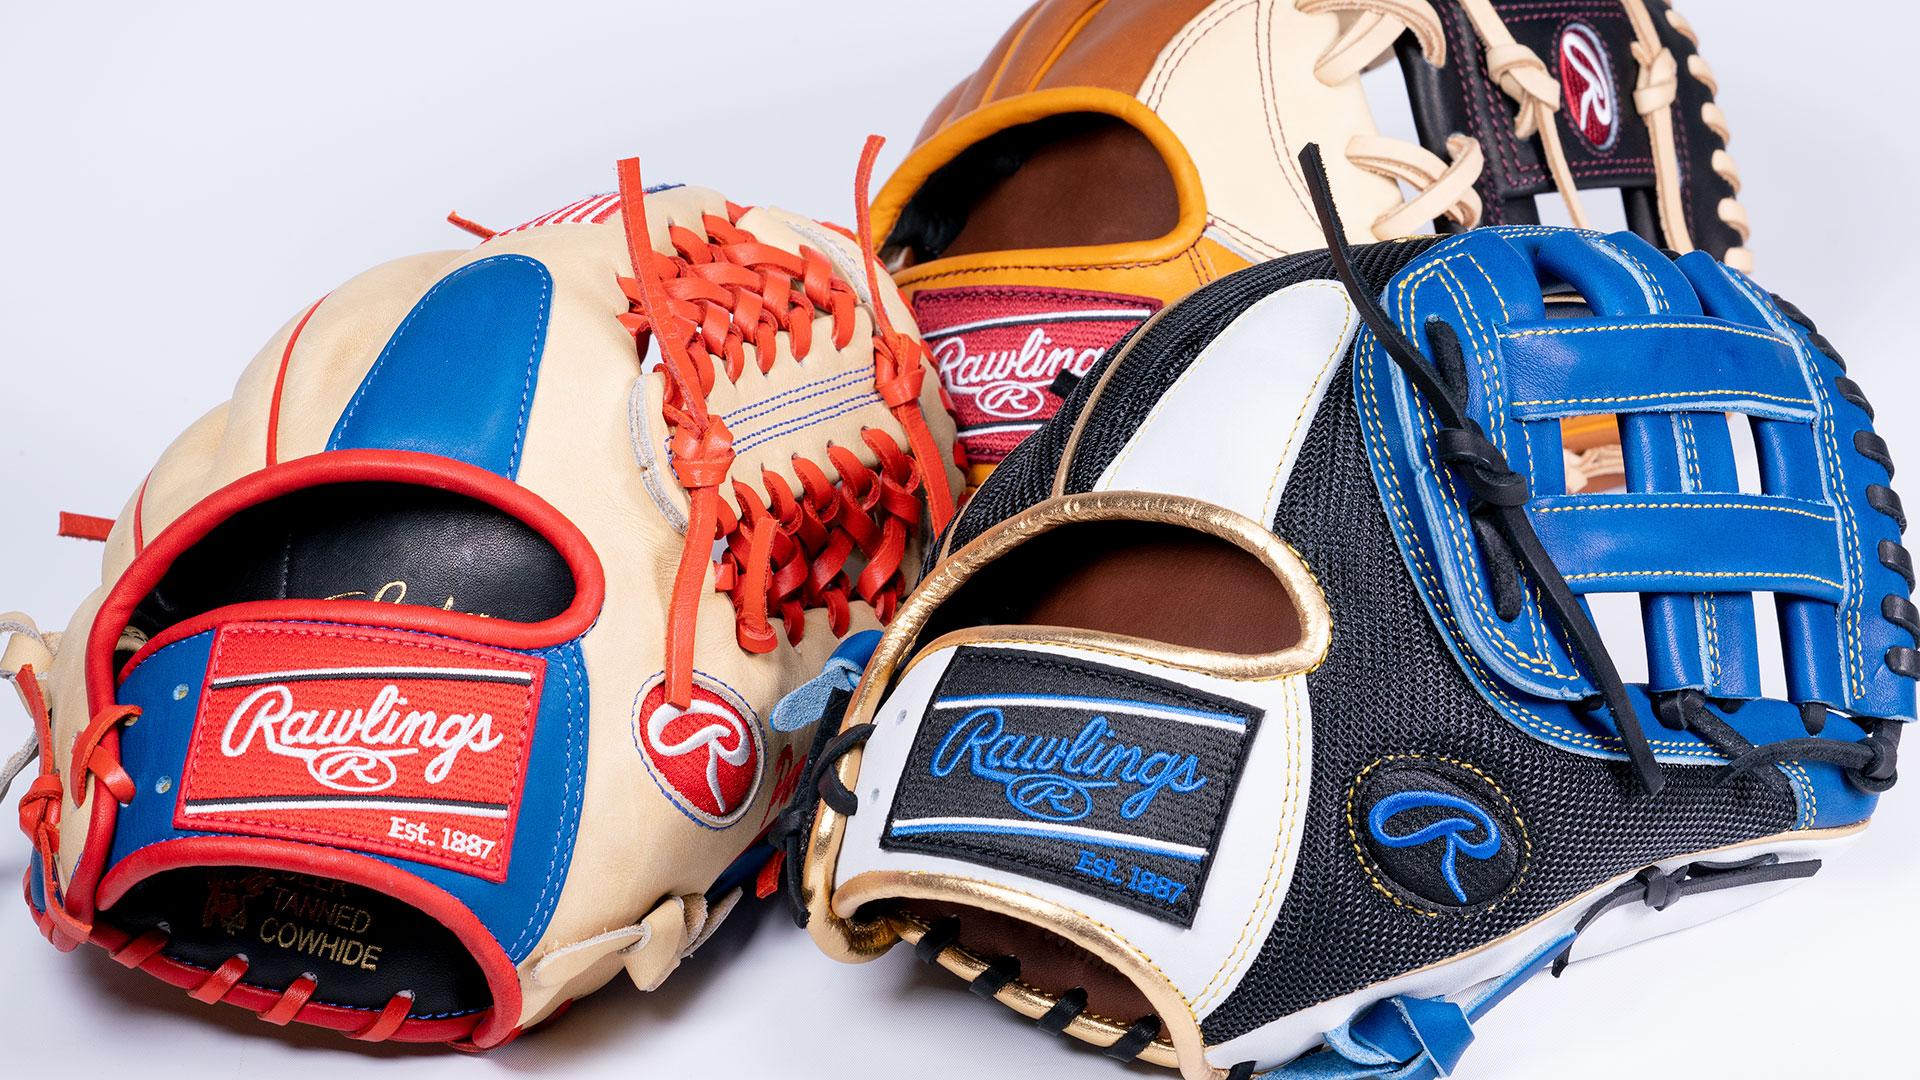 Custom Gloves for Baseball and Softball :: Rawlings com